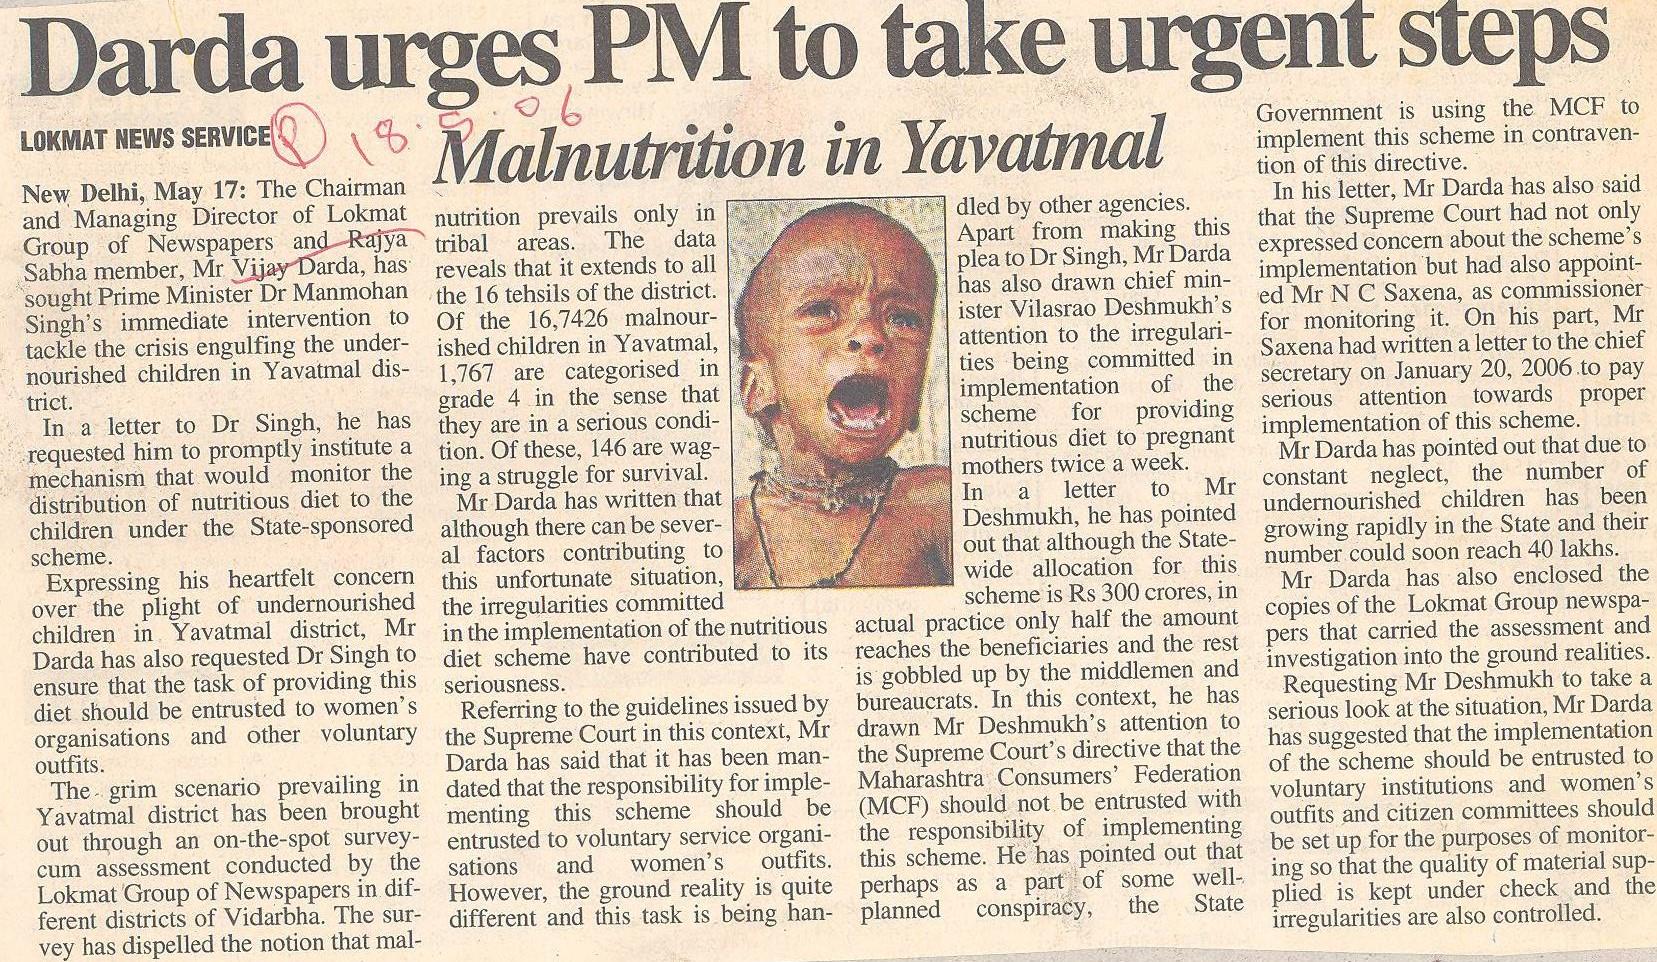 Darda urges PM to take urgent steps